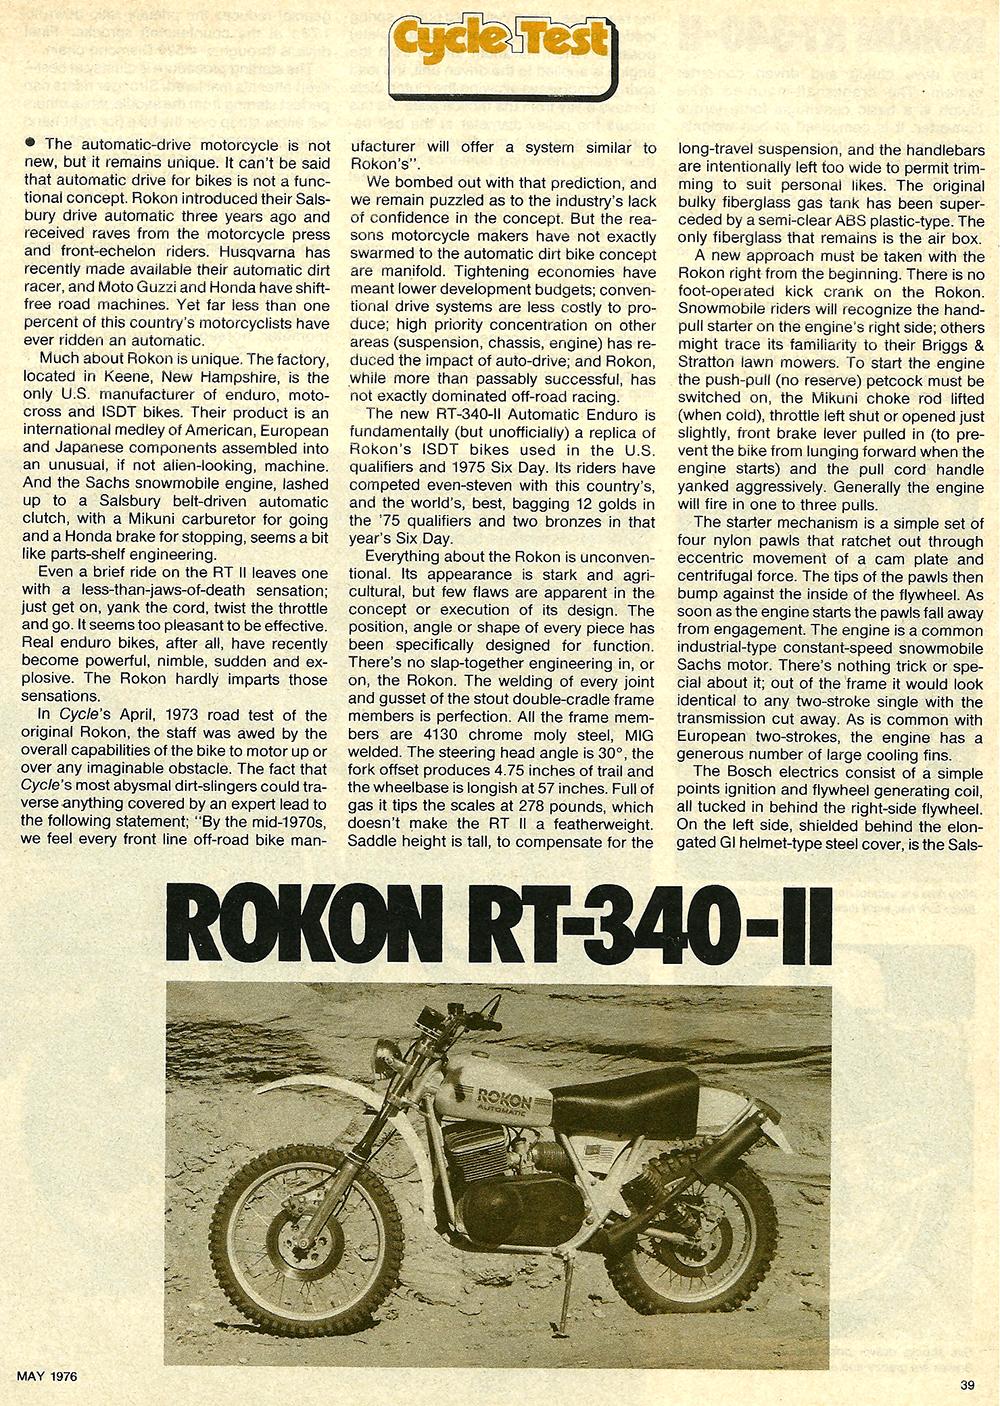 1976 Rokon RT-340 II road test 1.jpg